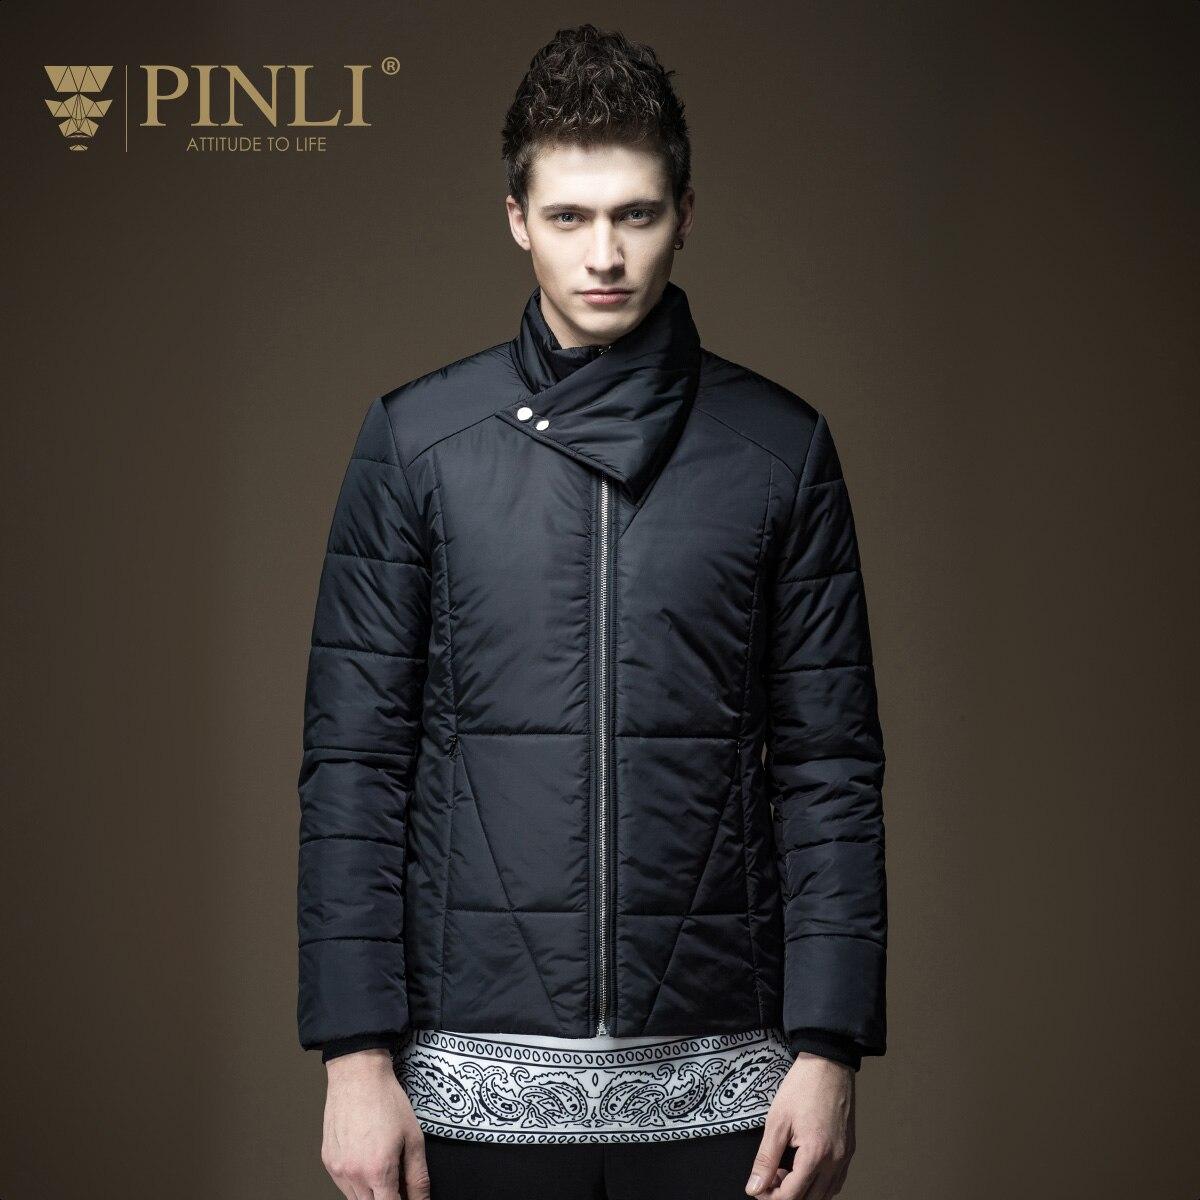 Winter Jackets Mens Top Fashion Acetate Regular Stand Standard Pinli 2017 New Mens Warm Coat Jacket B164105114 Одежда и ак�е��уары<br><br><br>Aliexpress